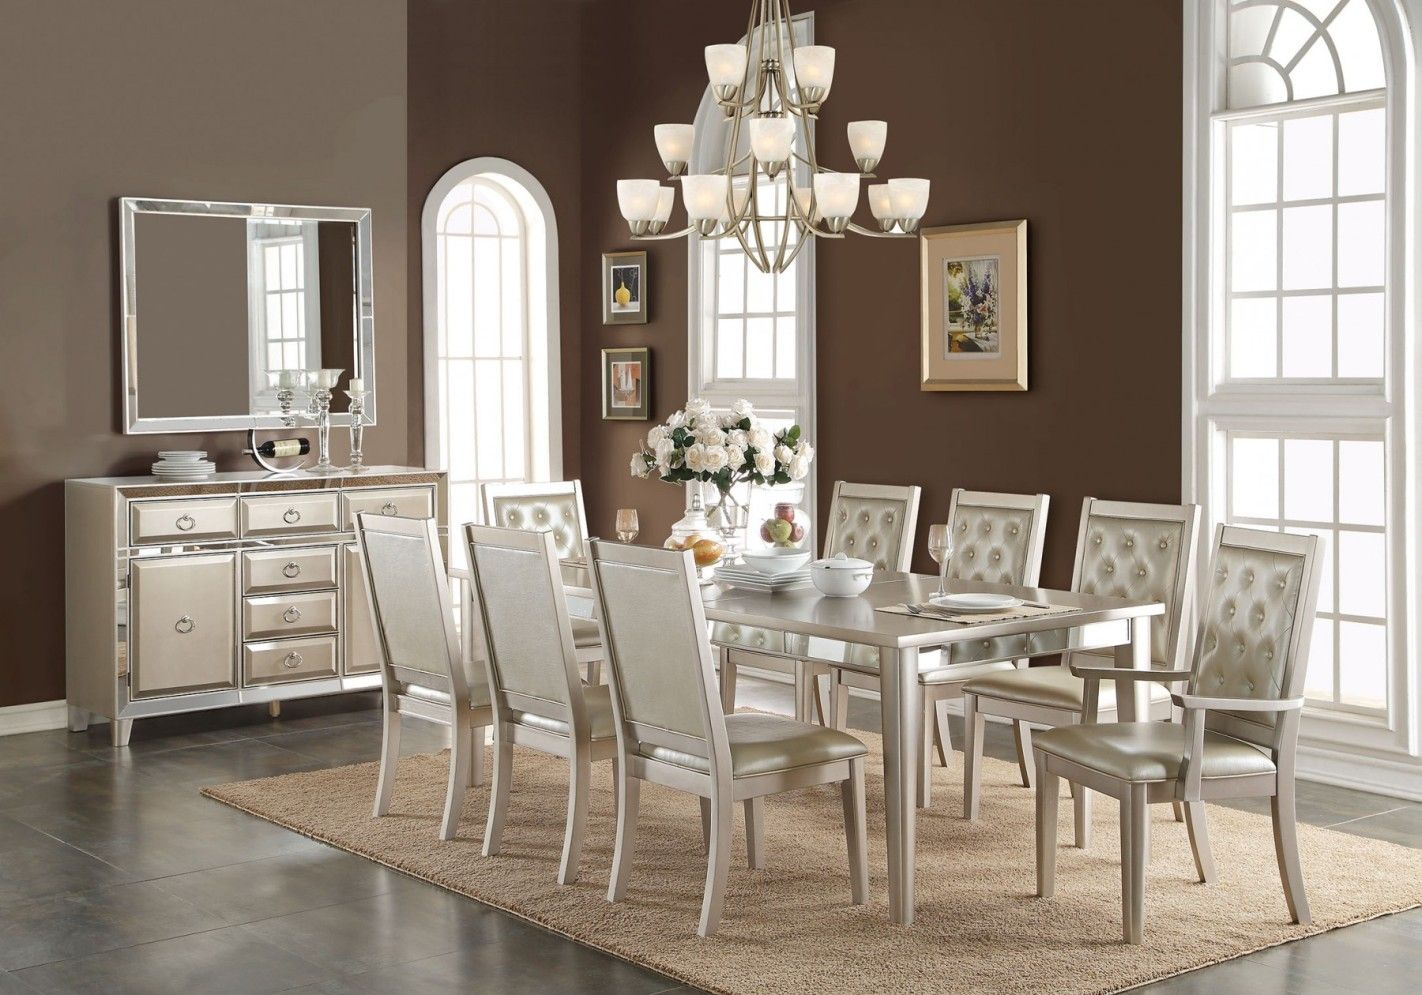 Formal Dining Room Sets  Improving How Your Dining Room Look Glamorous Antique Formal Dining Room Sets Design Ideas